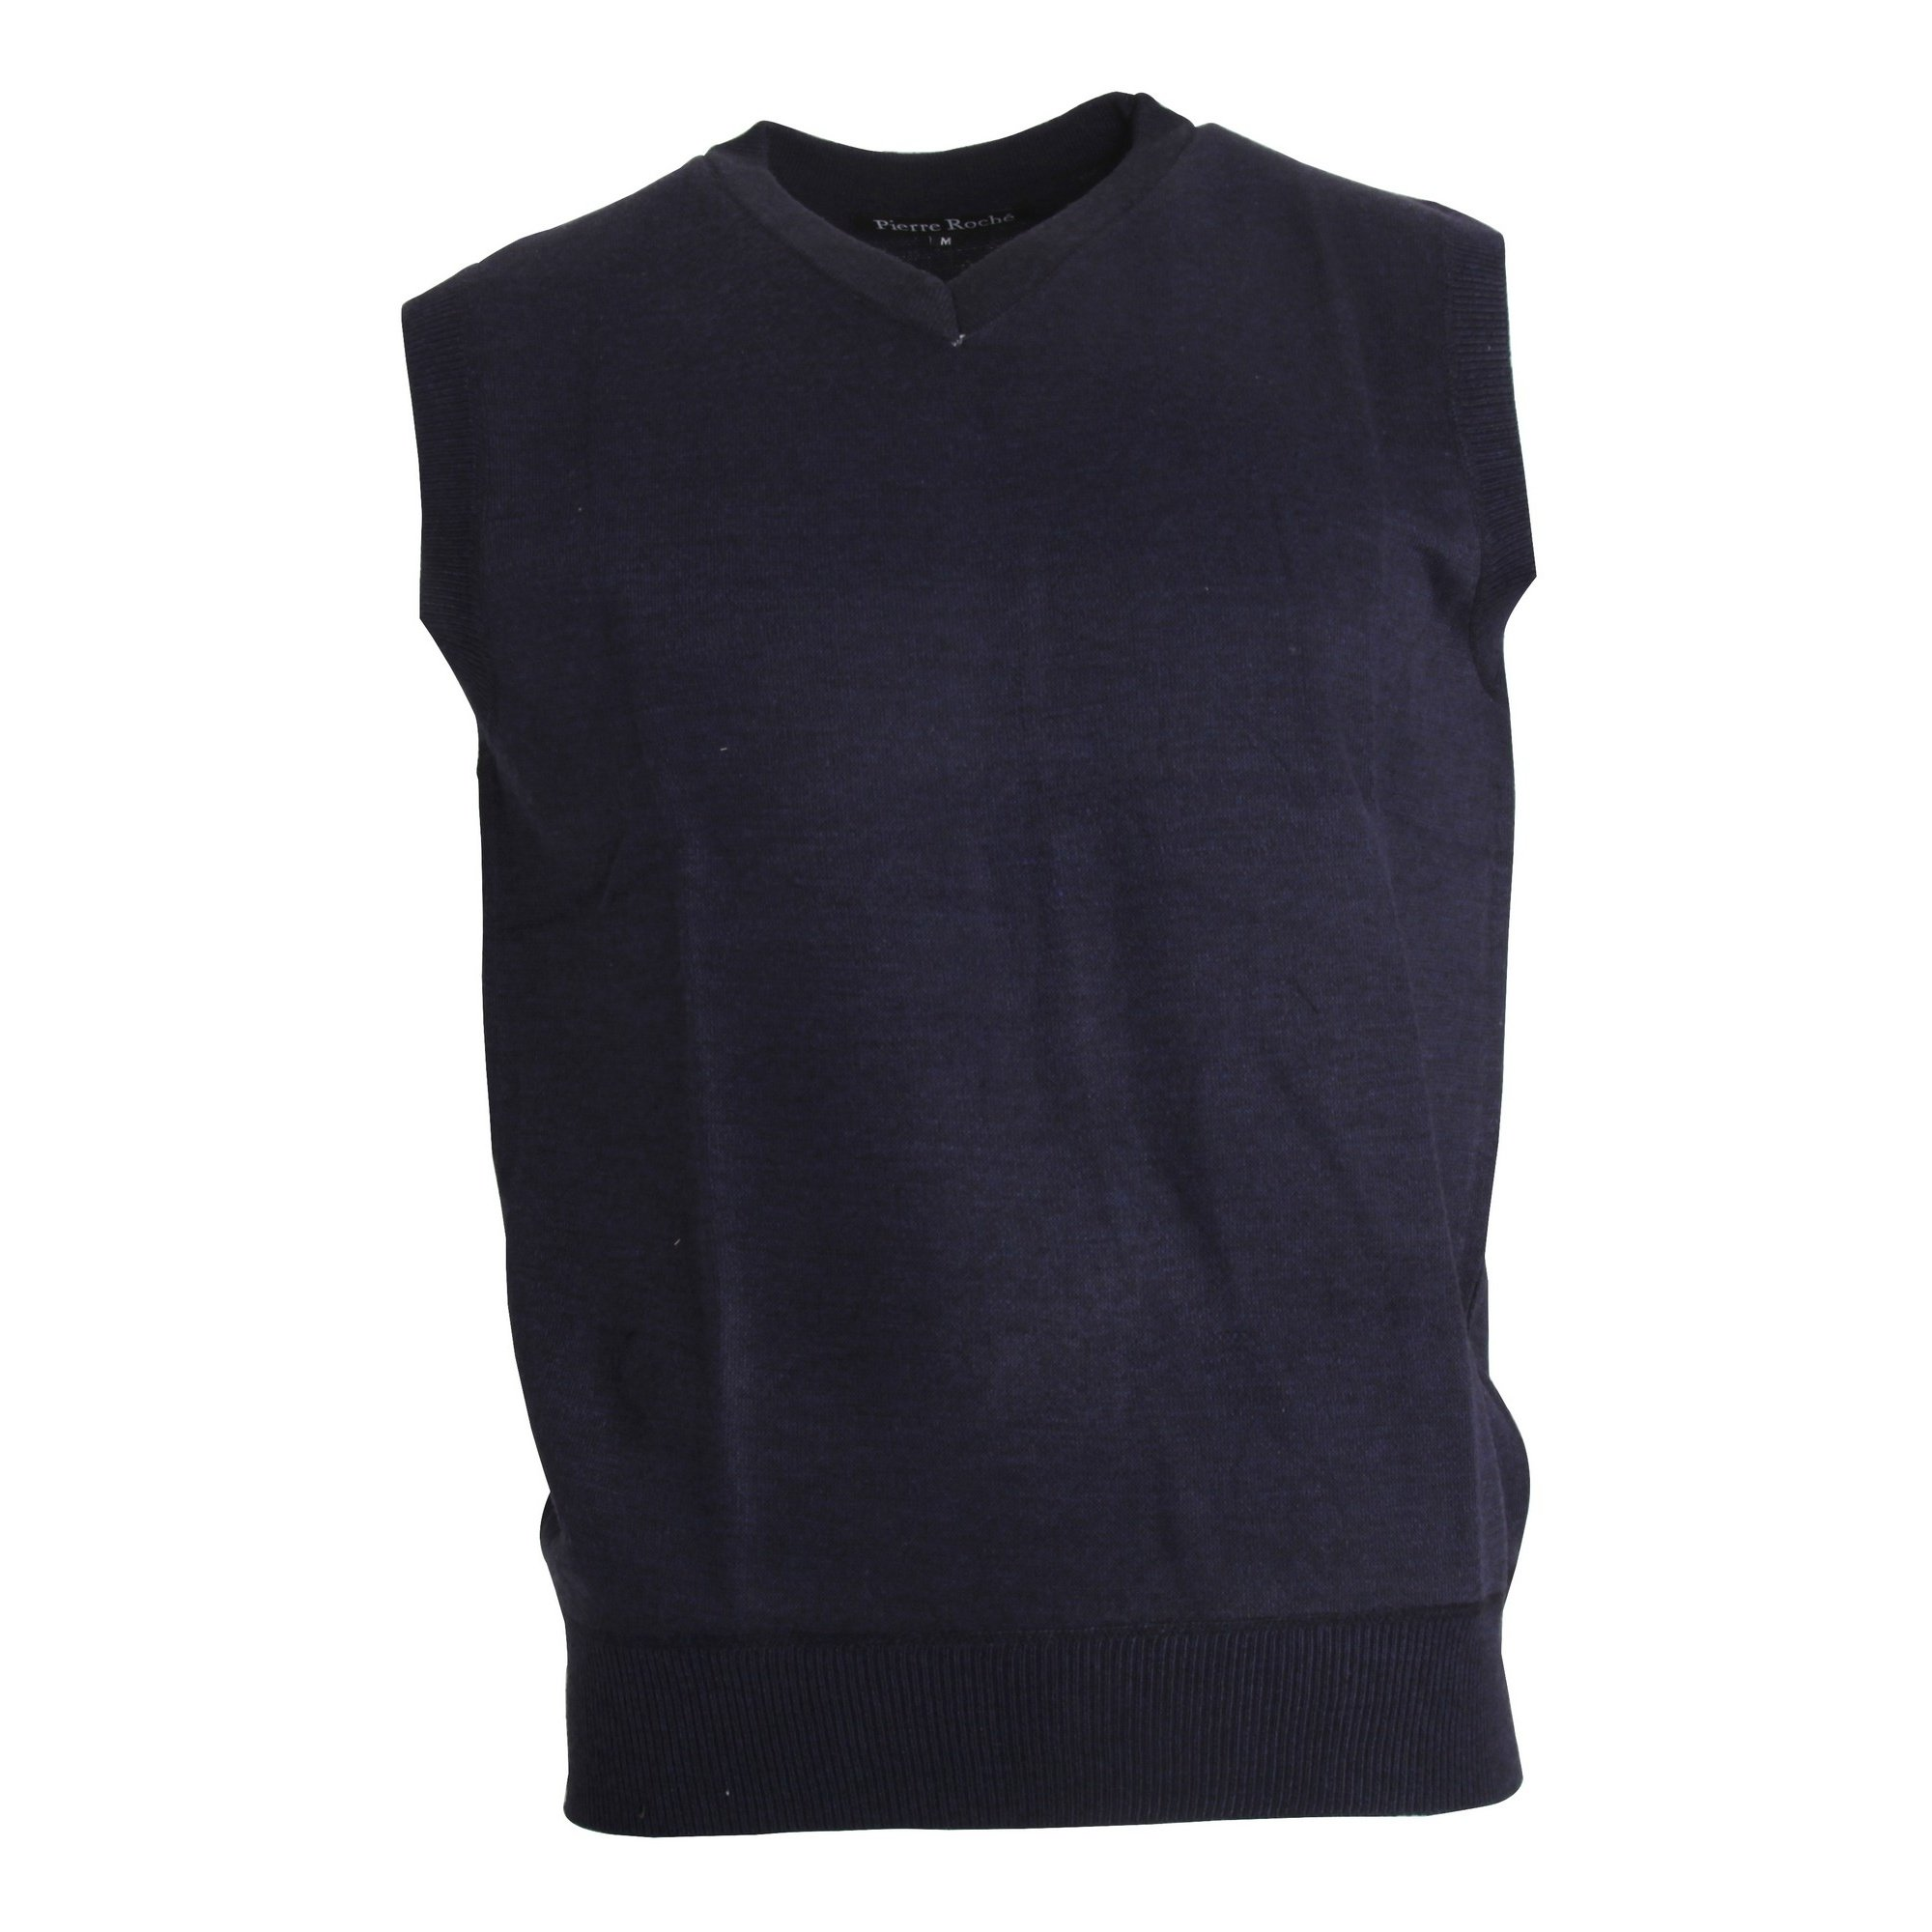 Pierre Roche Mens Plus Size V-Neck Sleeveless Sweater Vest (3XL) (Navy)